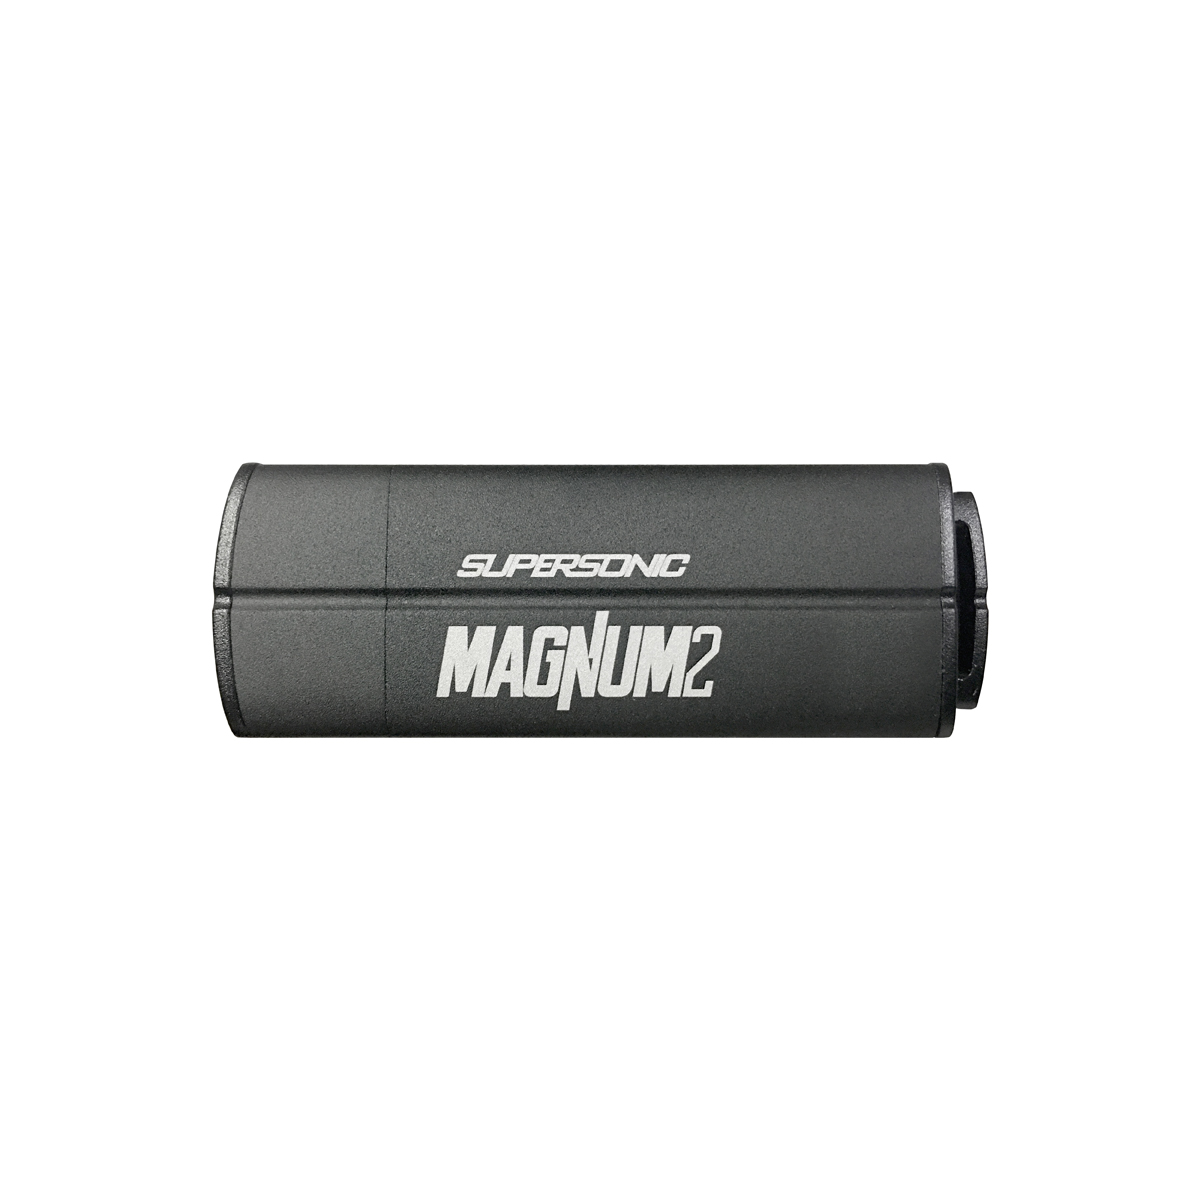 Patriot Supersonic Magnum 2 512GB USB 3.1 flashdisk (400MB/s;300MB/s)